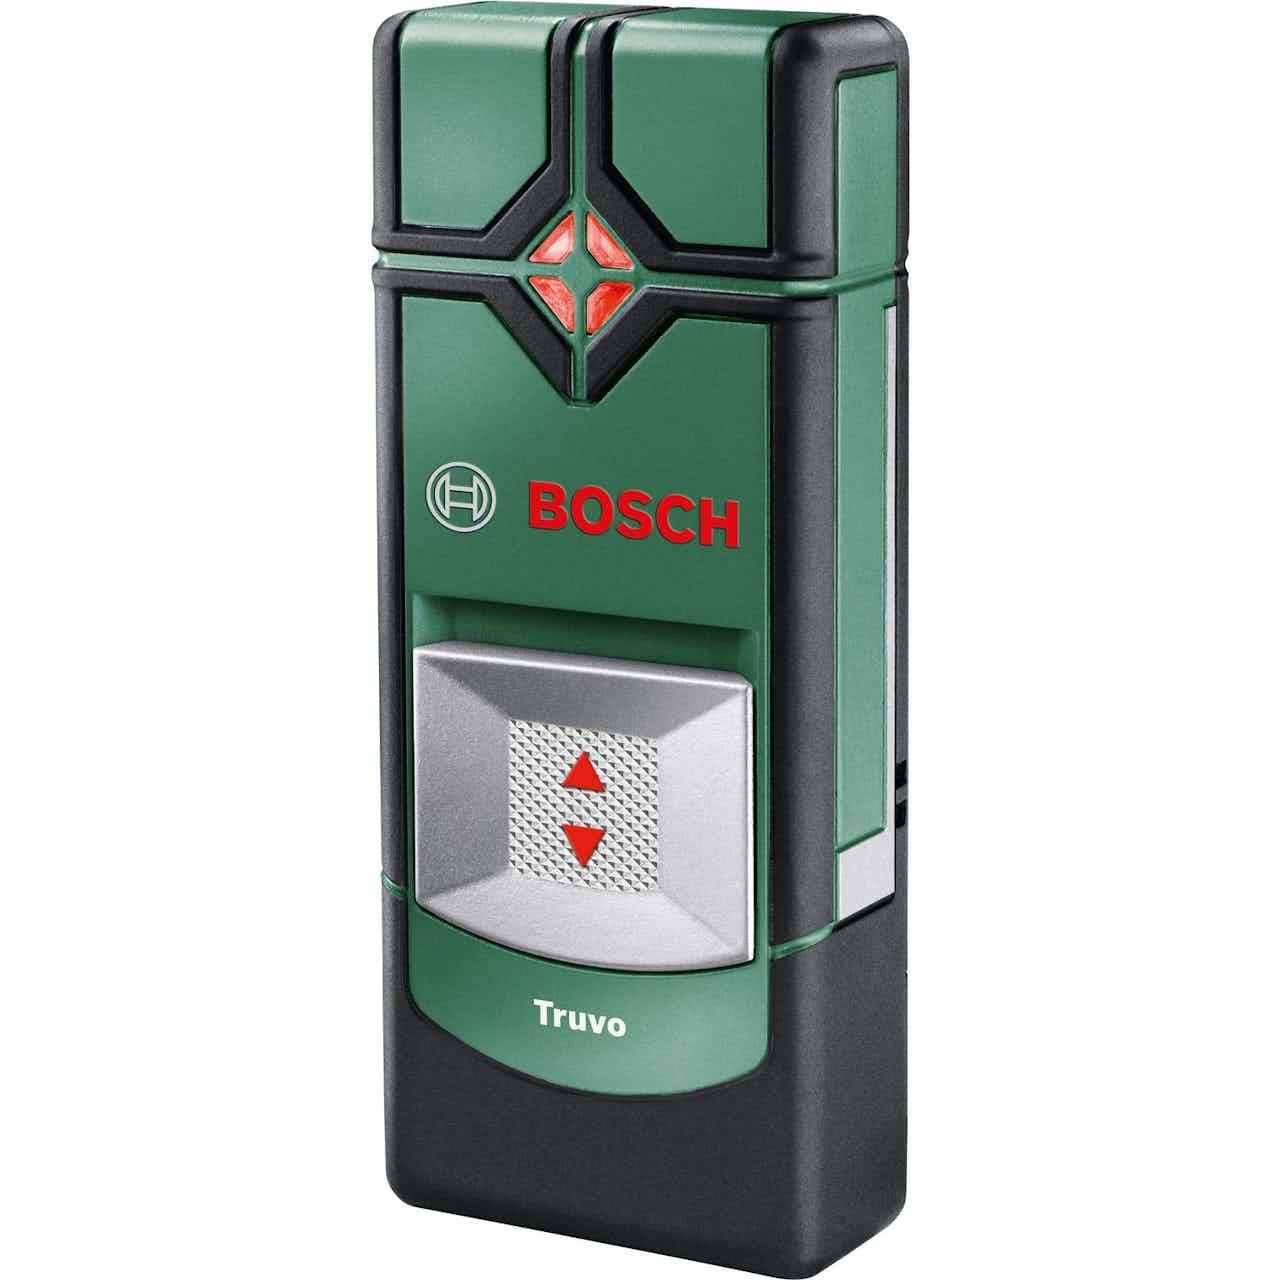 Bosch Digitales Ortungsgerät Truvo max. Ortungstiefe 70 mm